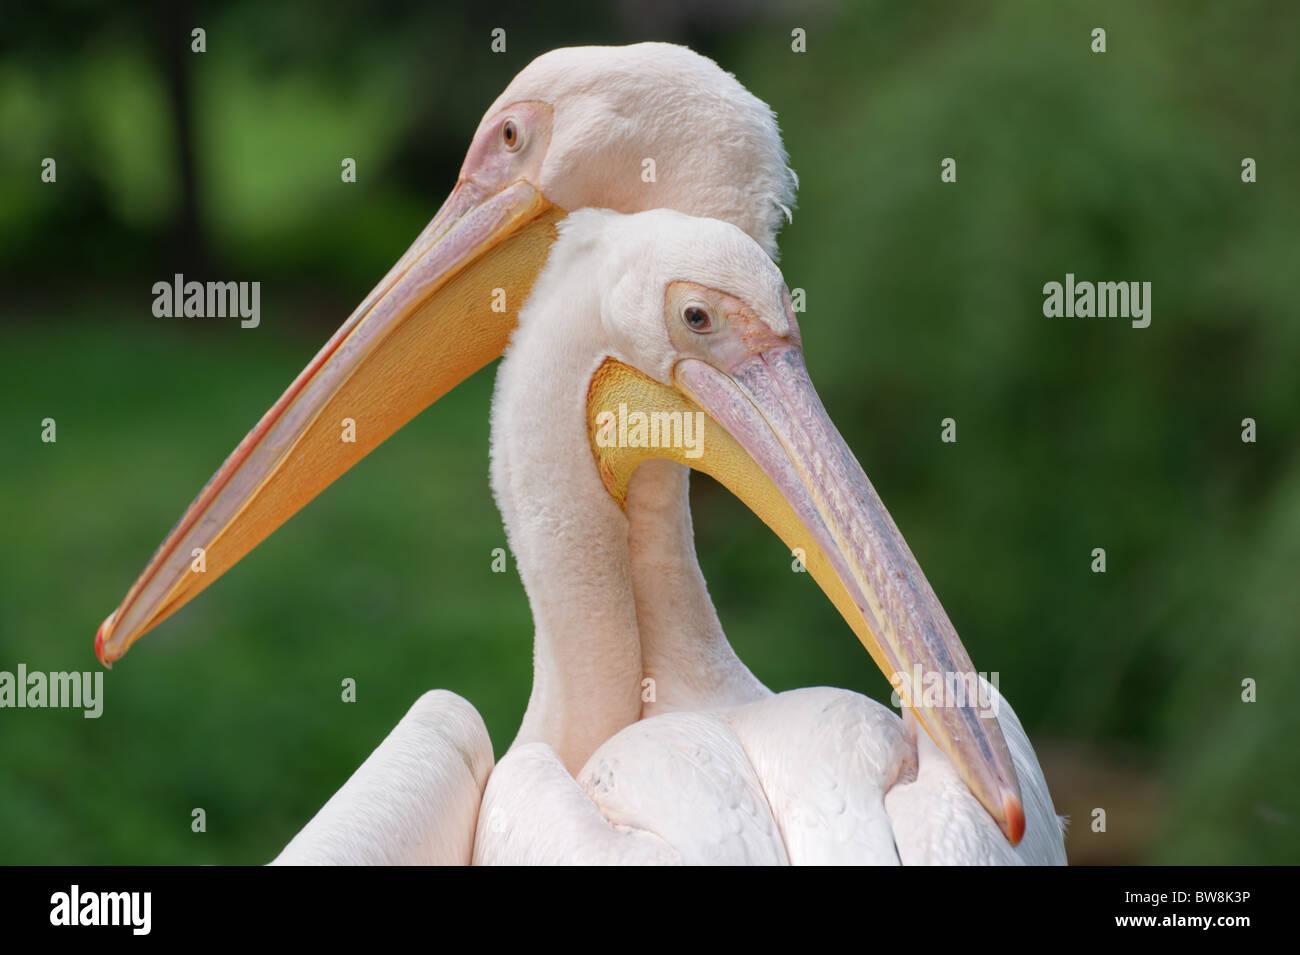 Great white pelican (Pelecanus onocrotalus) pair closeup - Stock Image